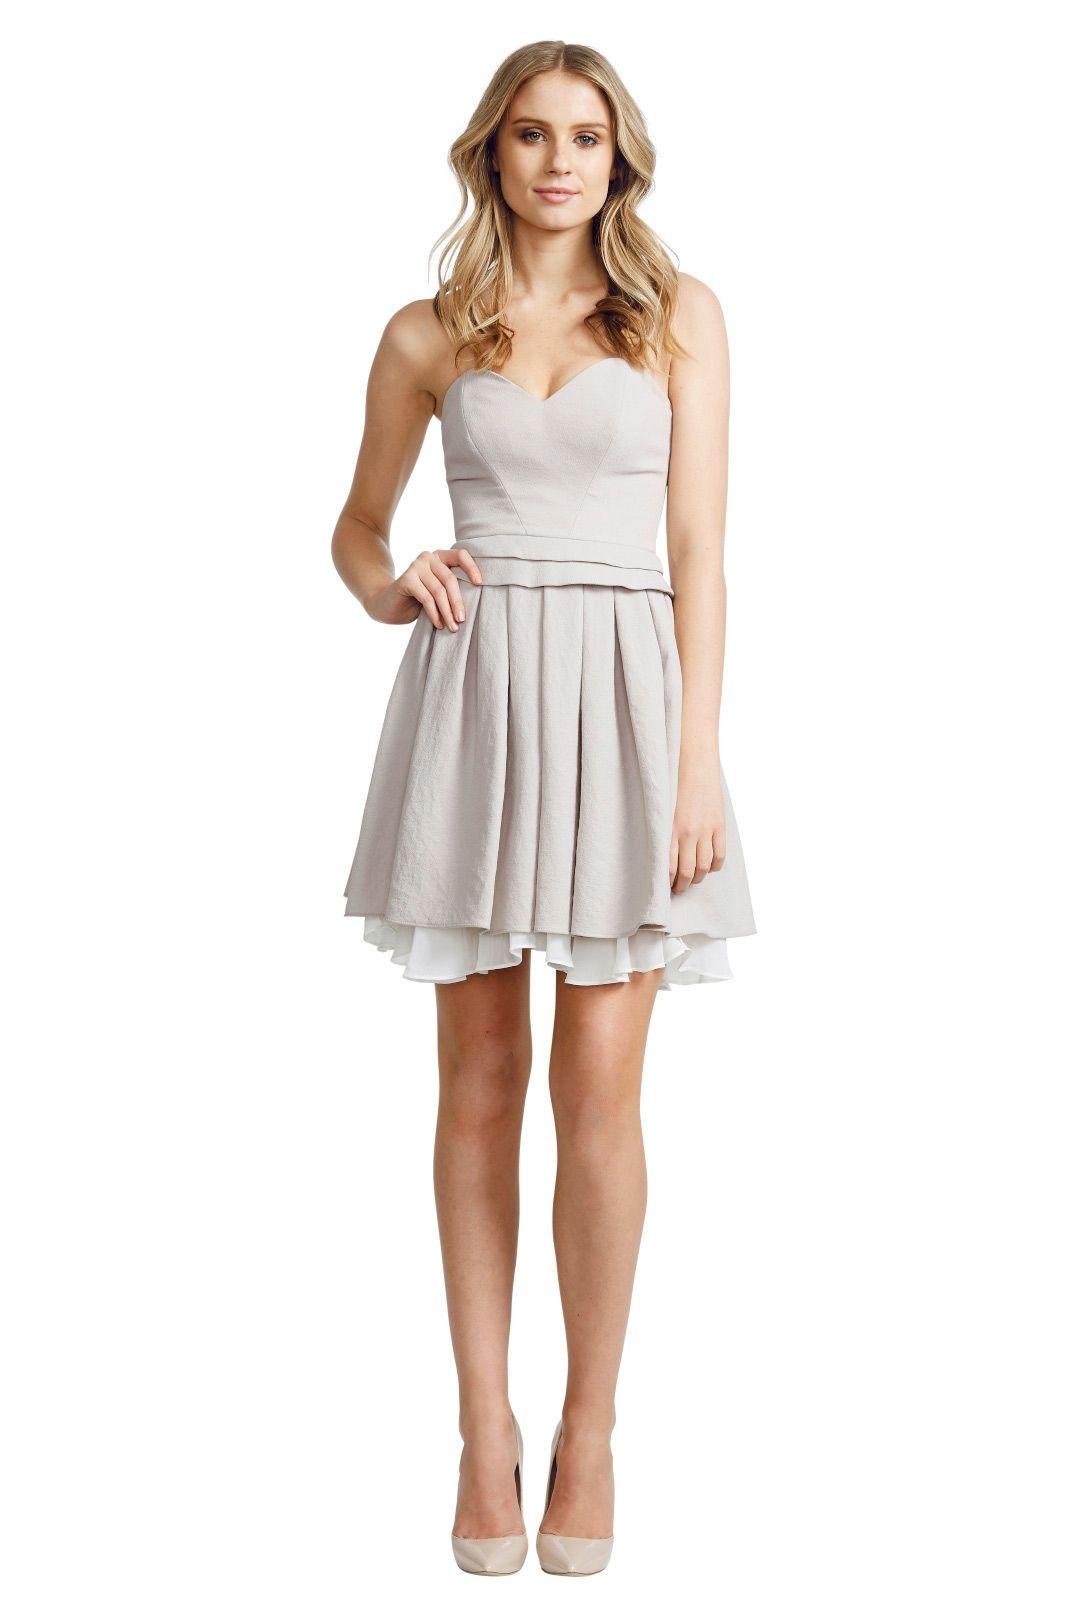 Nicola Finetti - Layer Pleat Dress - Grey - Front